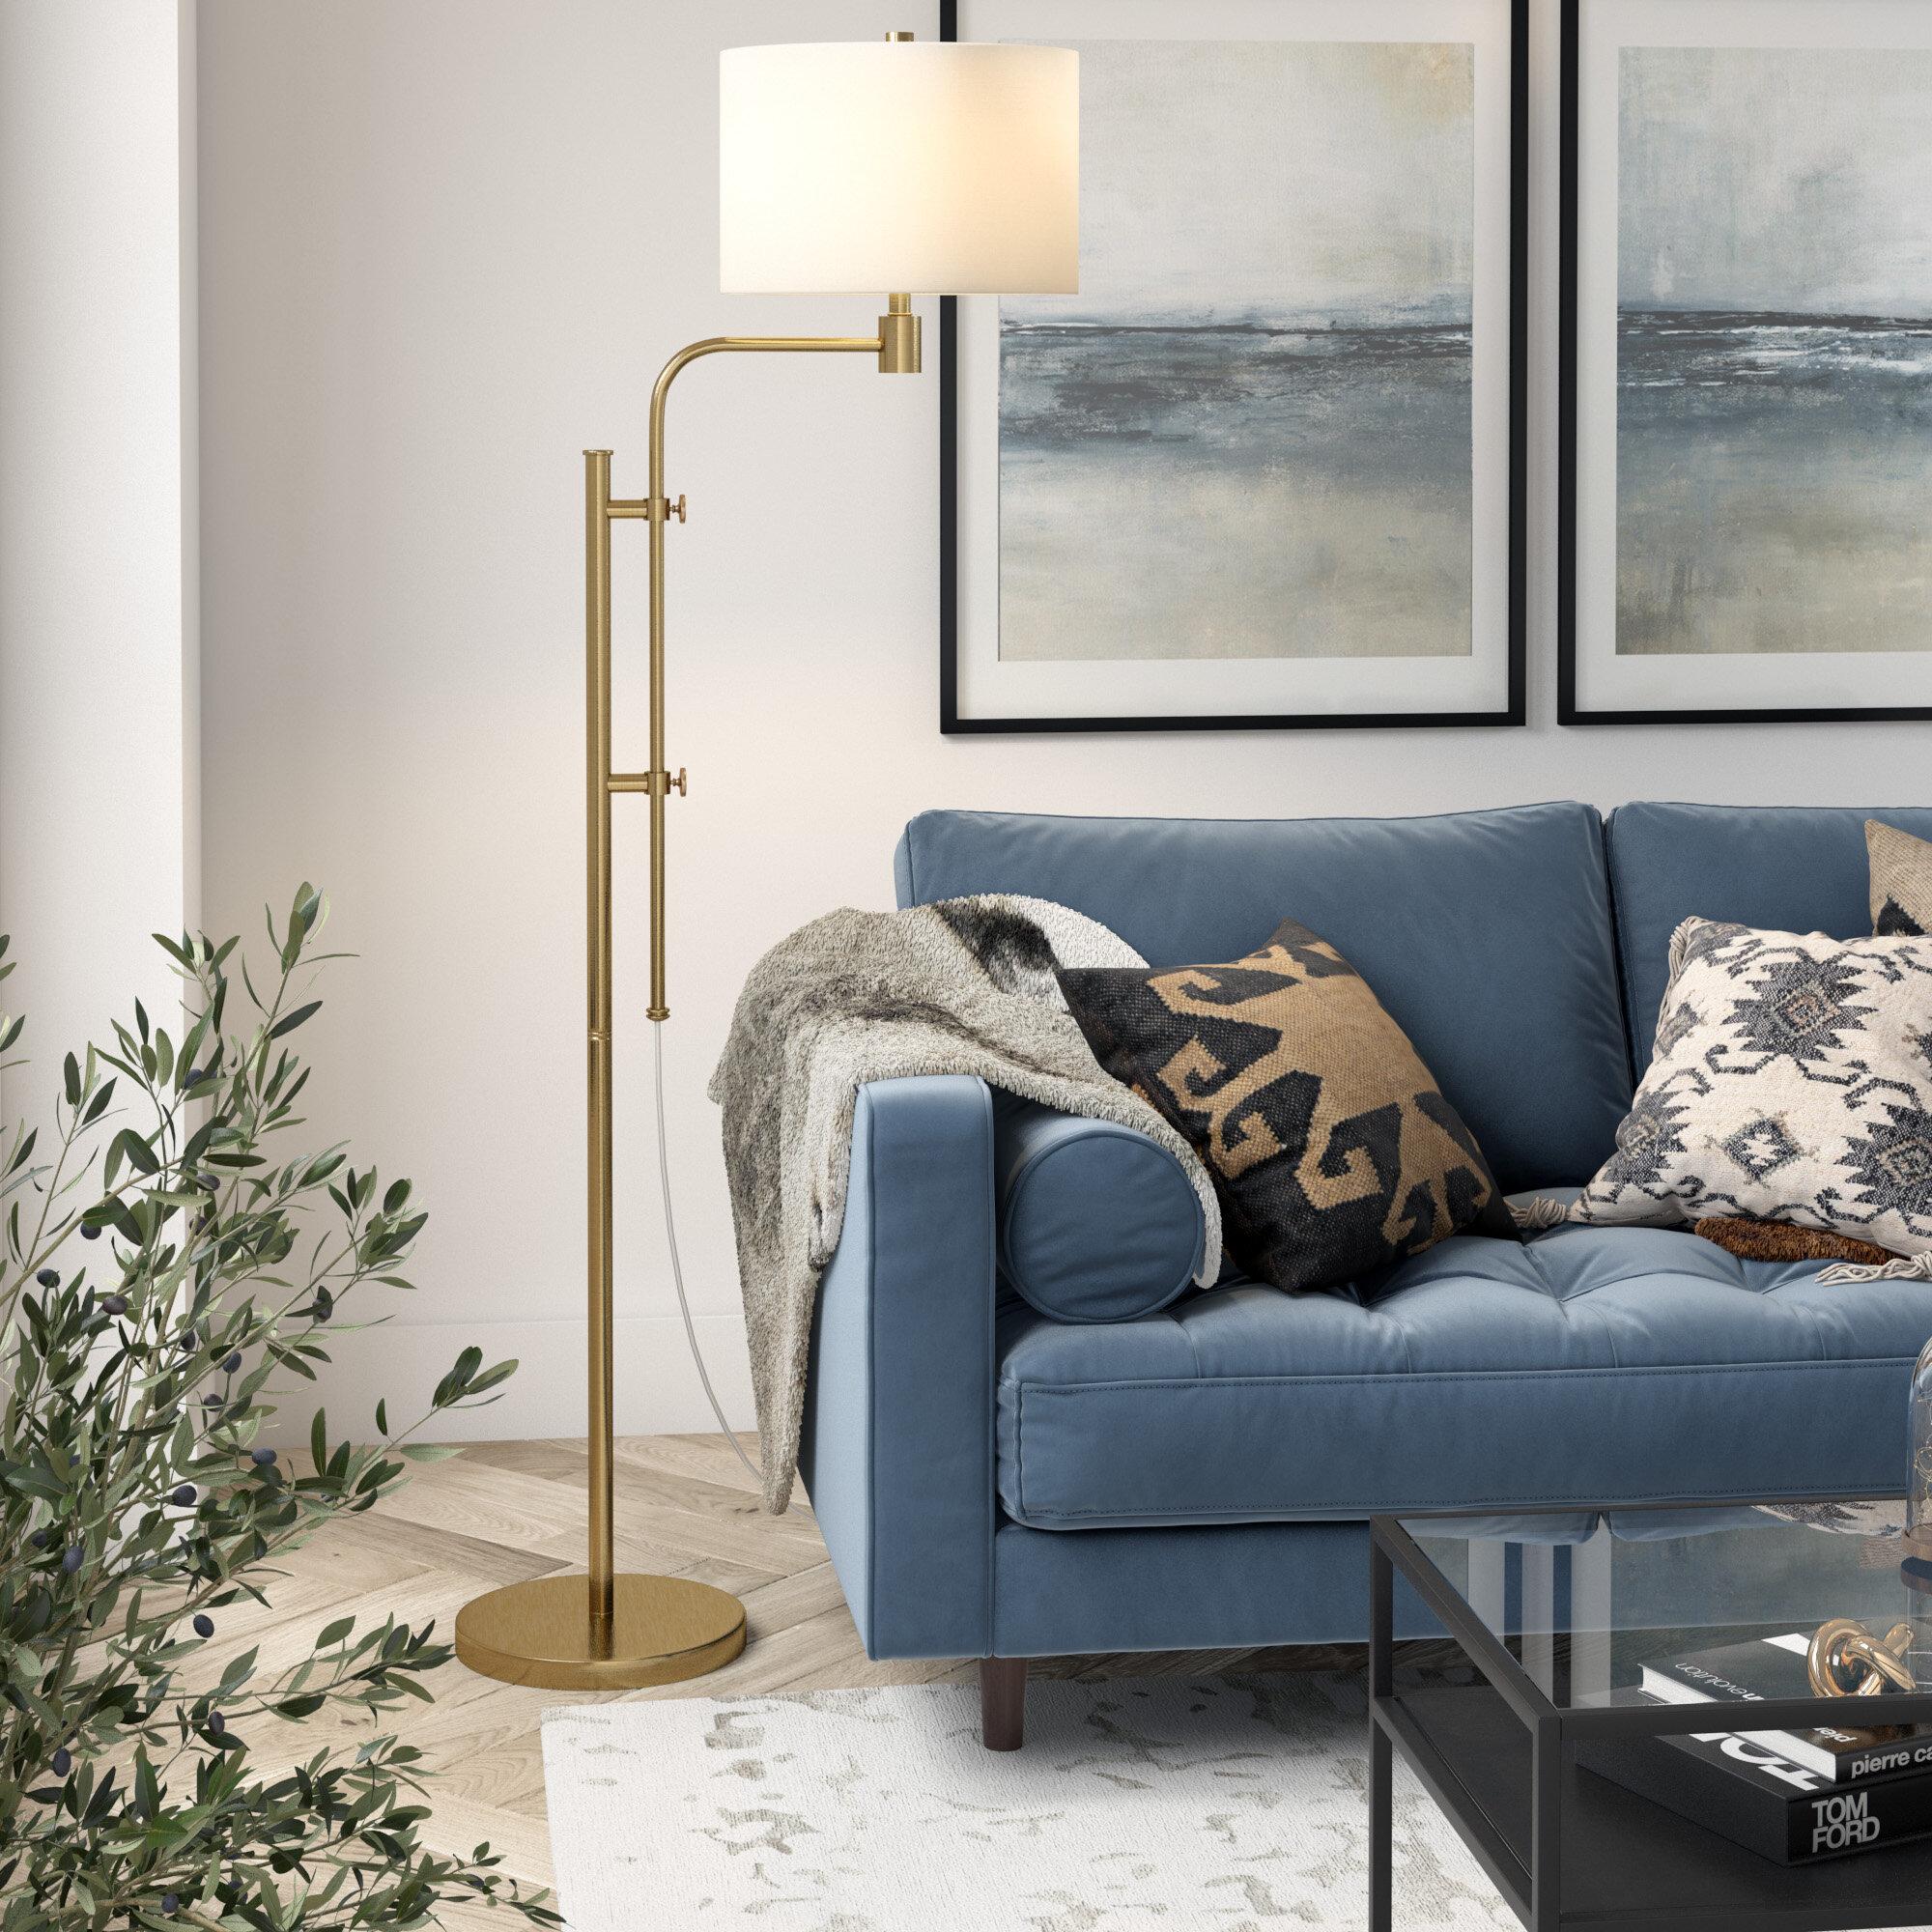 Offutt 72 Swing Arm Floor Lamp